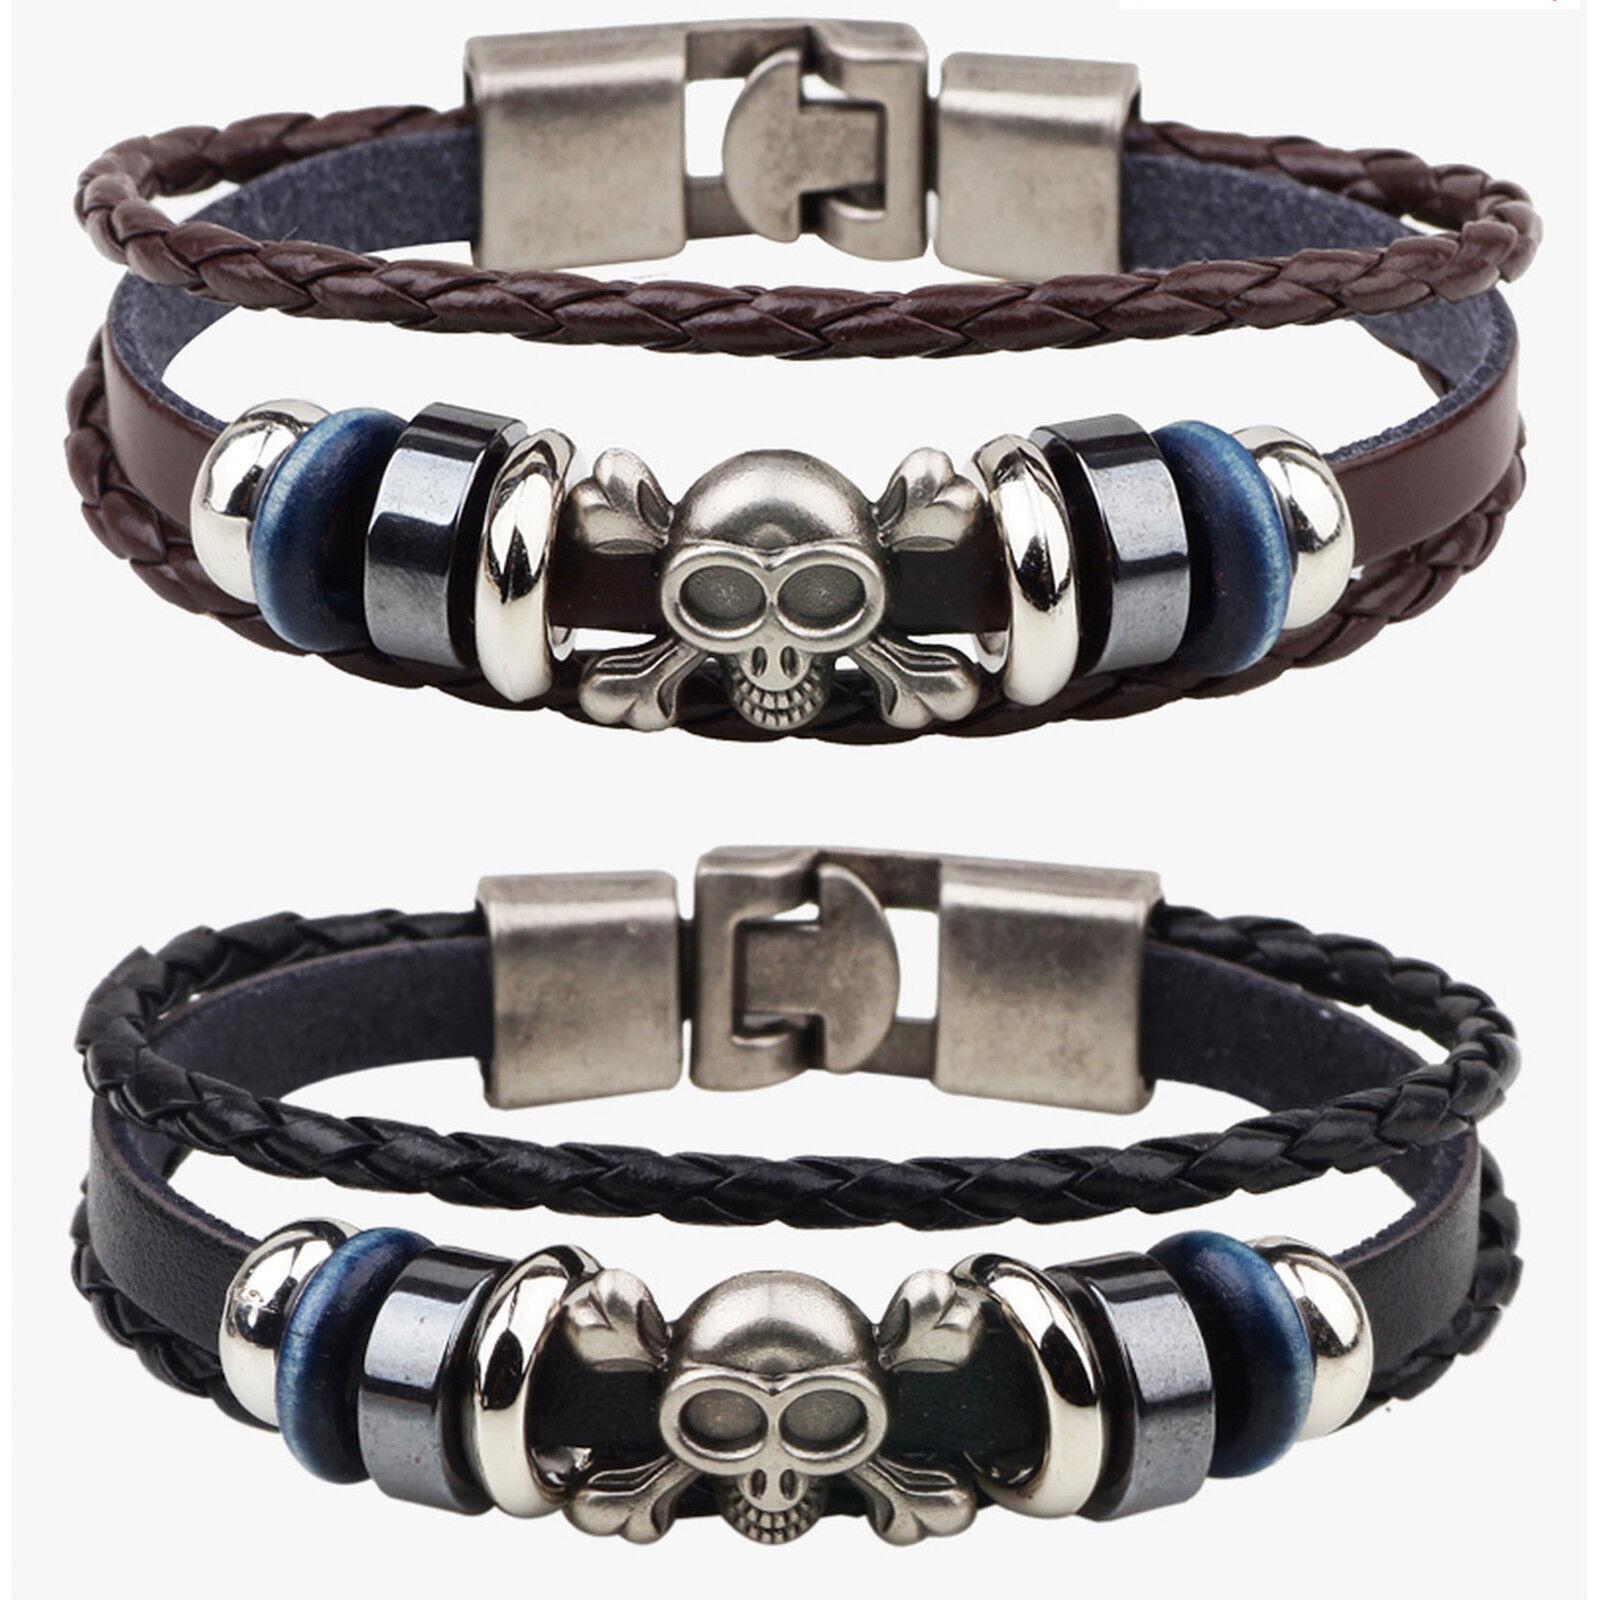 Men's Gothic Skull Crossbones and Beads Leather Wristband Bracelet Bracelets